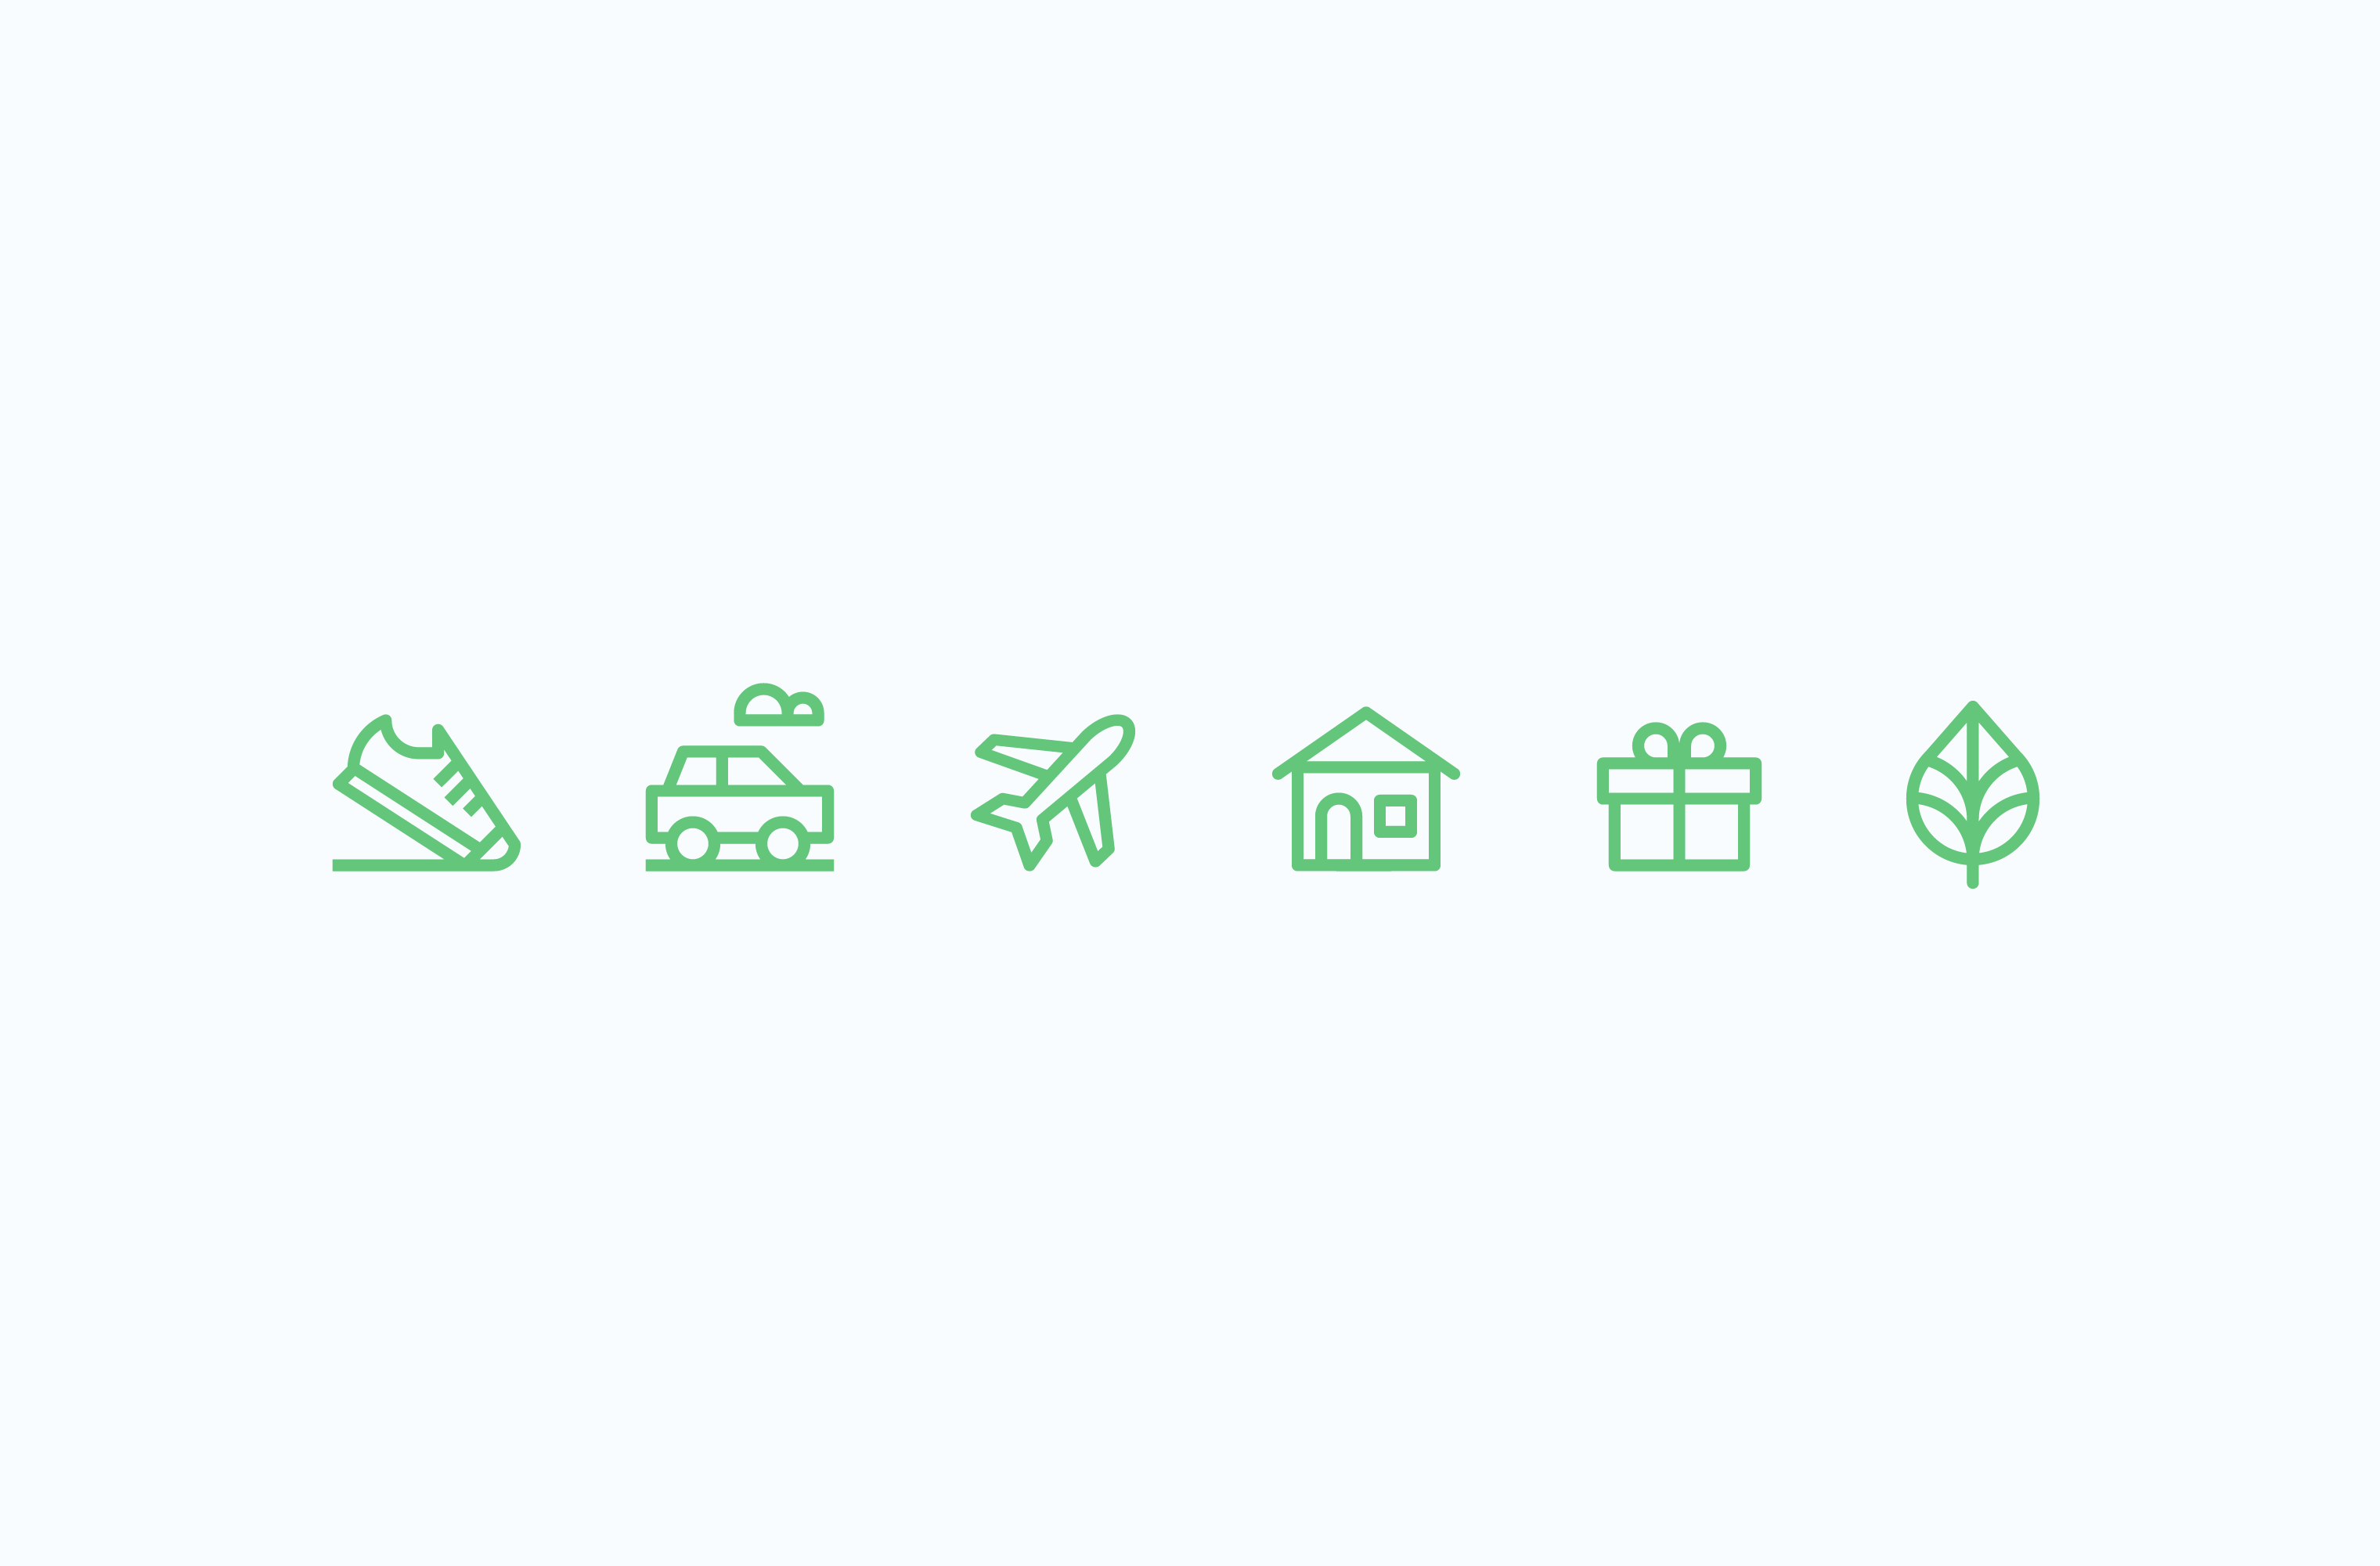 Carbonfund carbon offset icon set